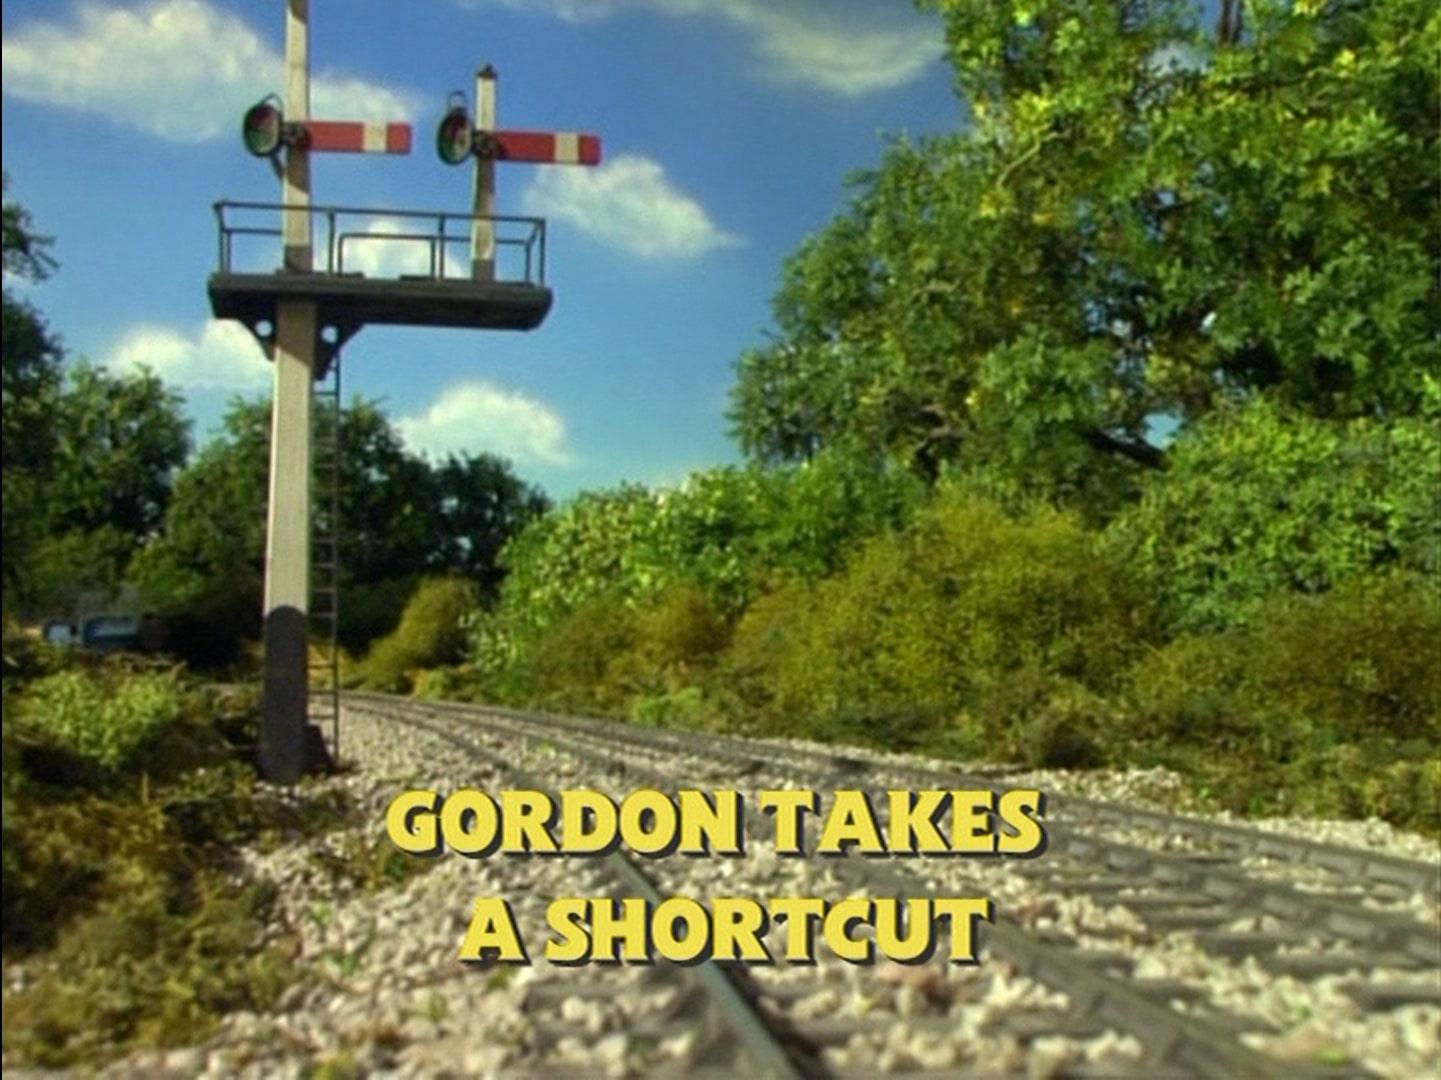 File:GordonTakesaShortCutUStitlecard.jpg